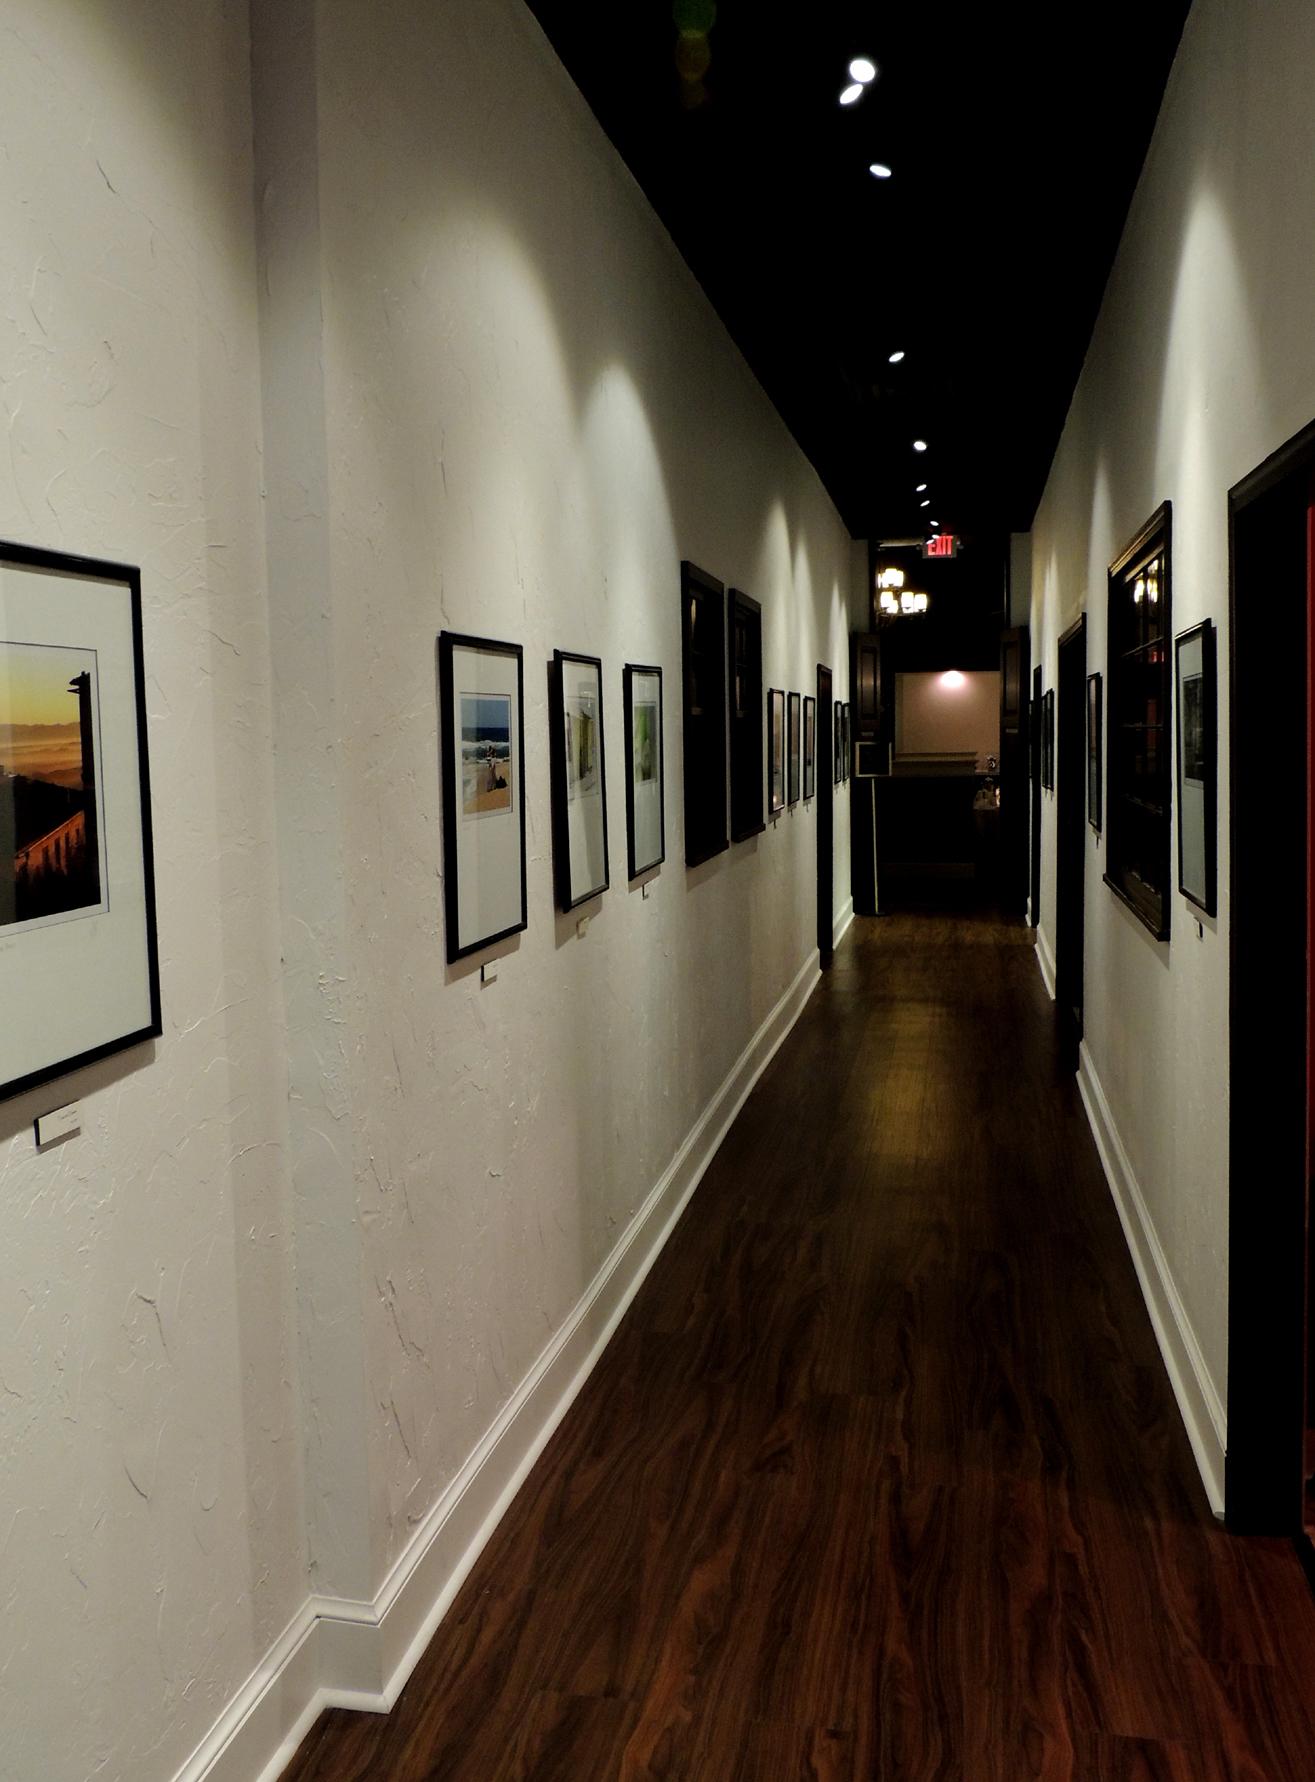 Gallery at La Petite Auberge, Fredericksburg Va